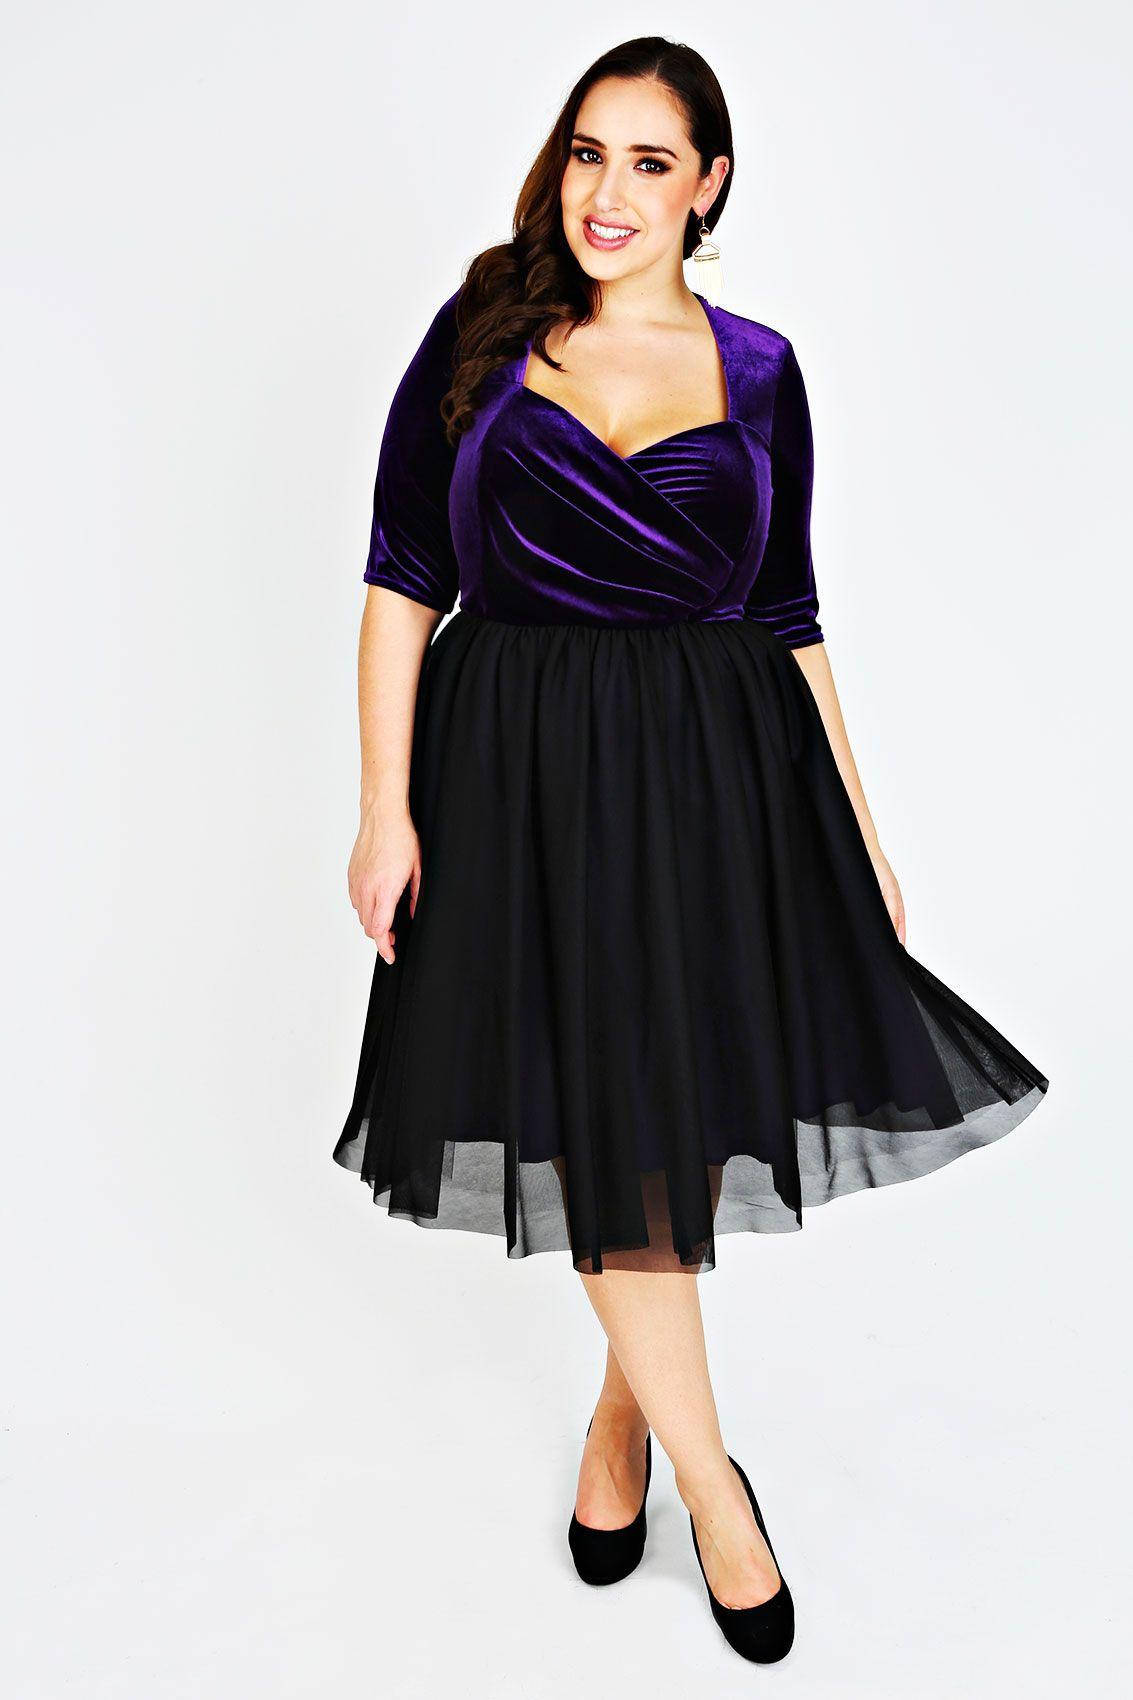 SCARLETT & JO Black & Purple Velvet Prom Dress   Curvy evening ...